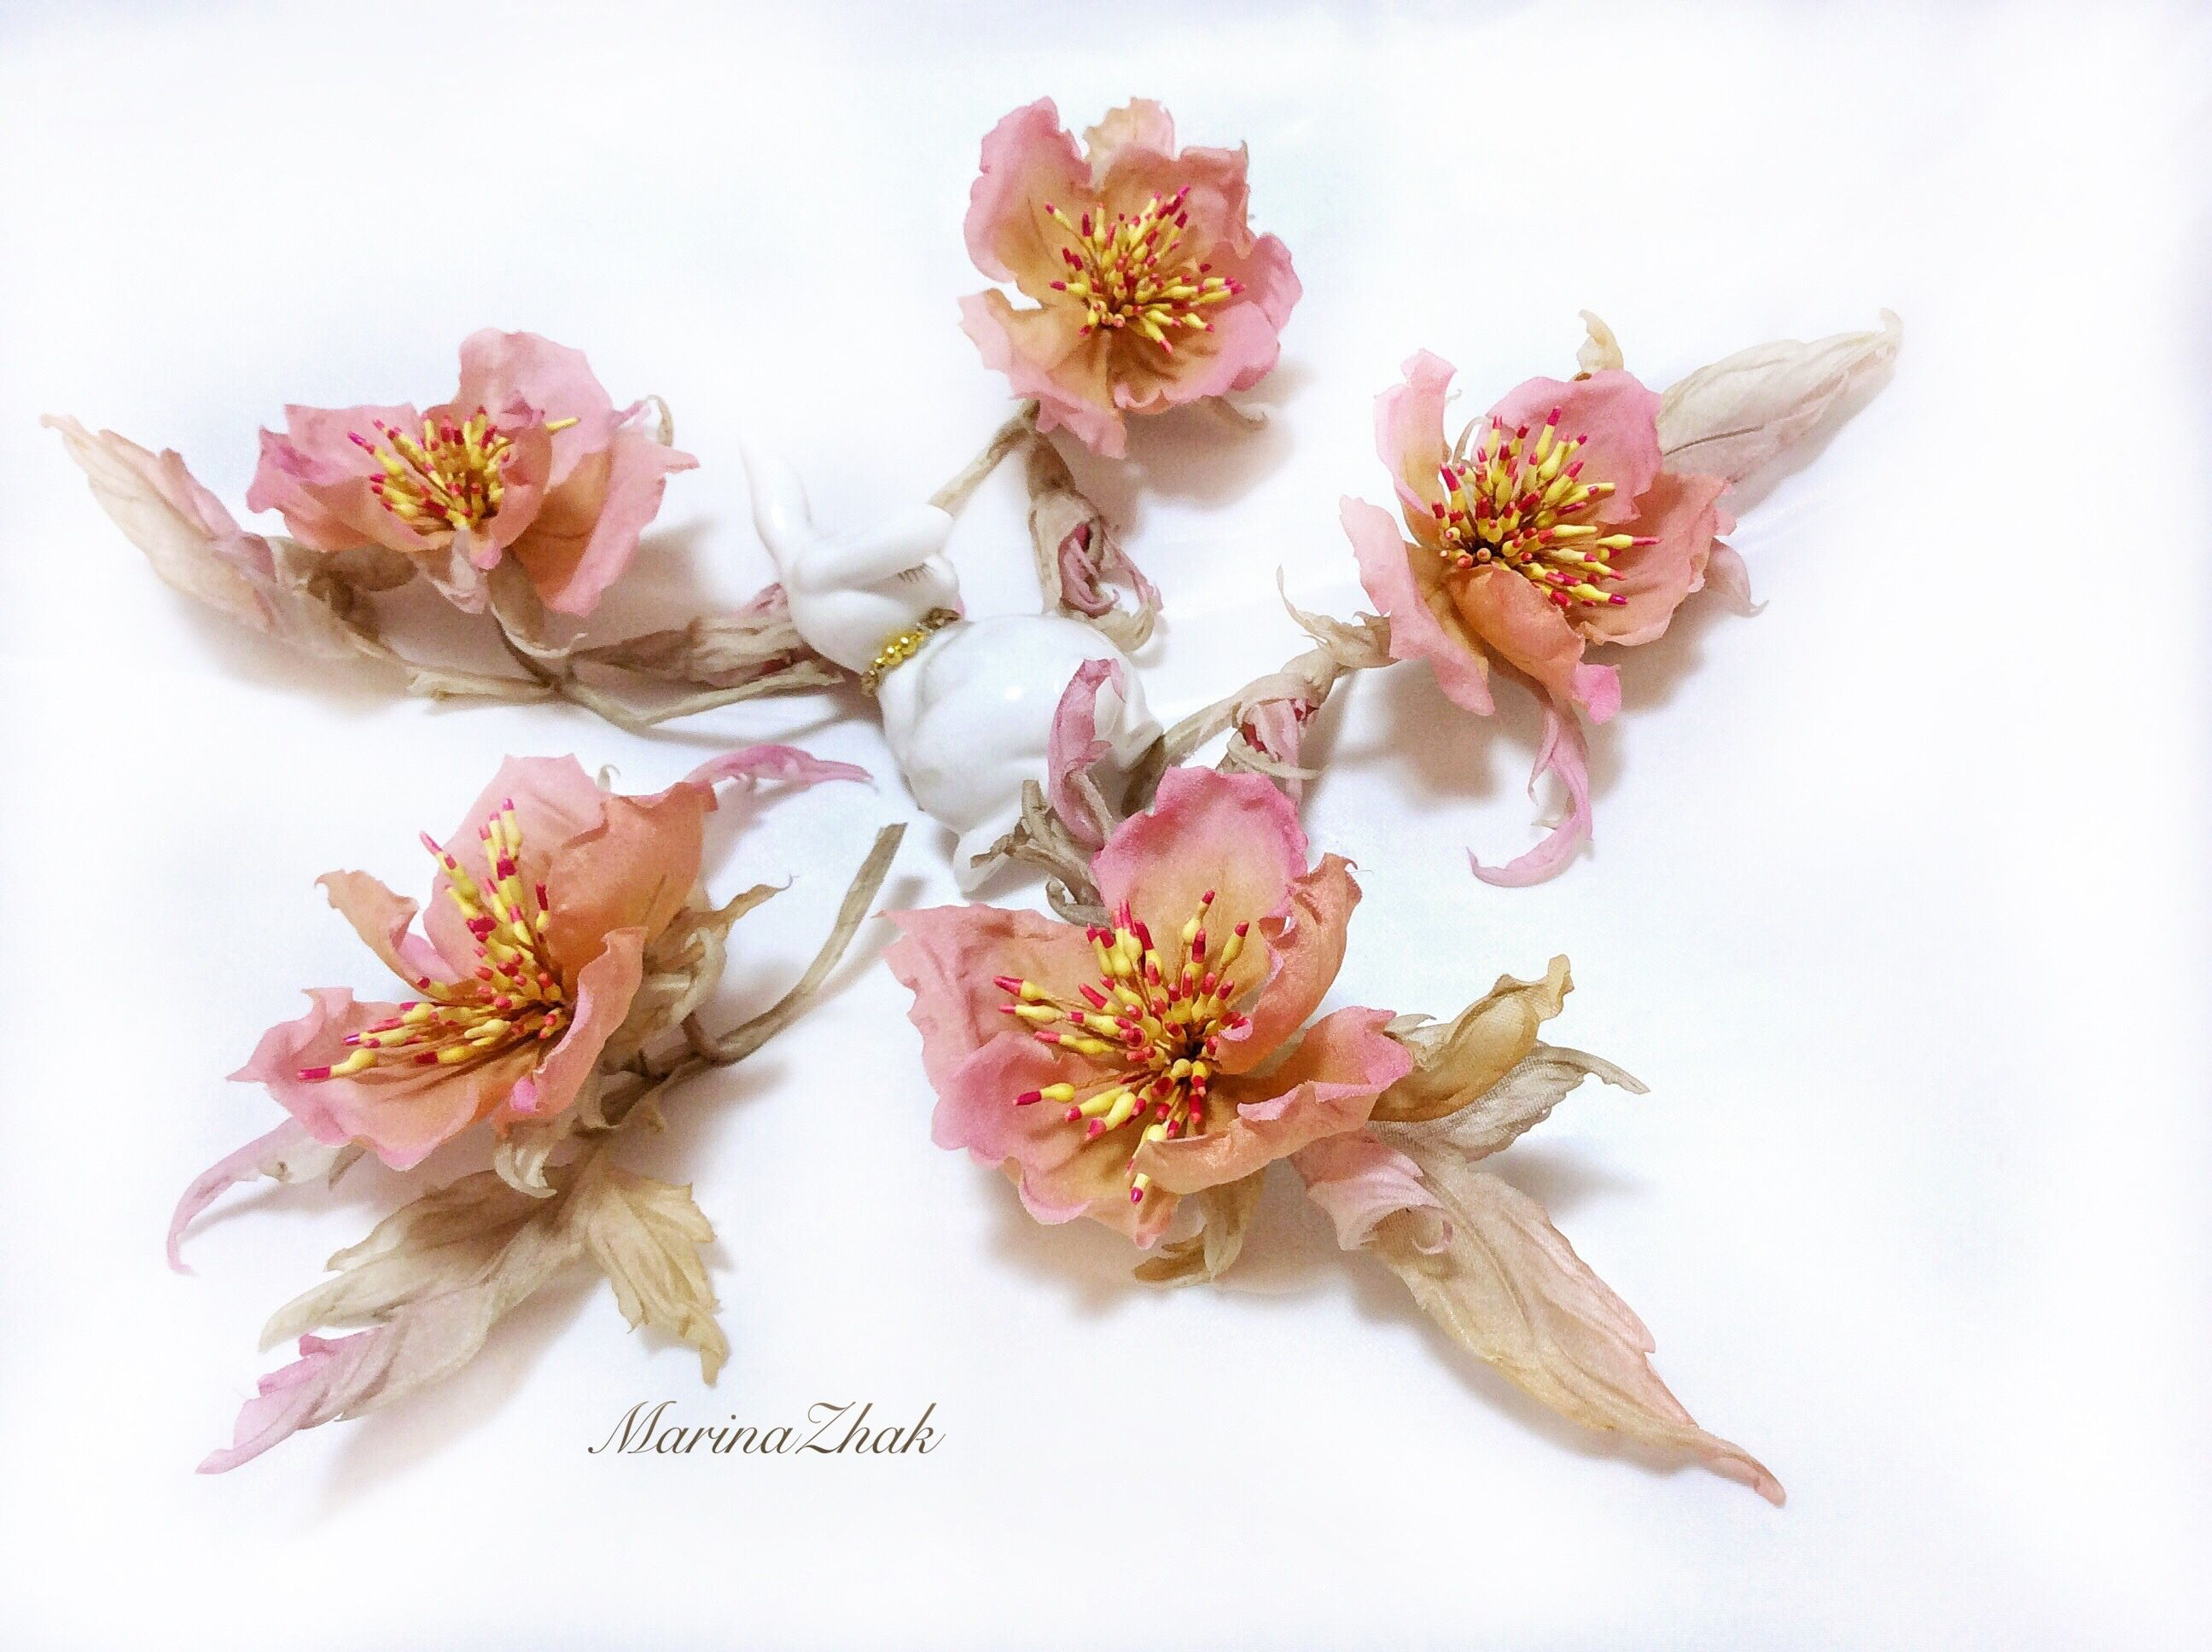 Silk rose somebanalk rosehip ding for weddingr hair silk rosehip ding for weddingr hair silk flowers mightylinksfo